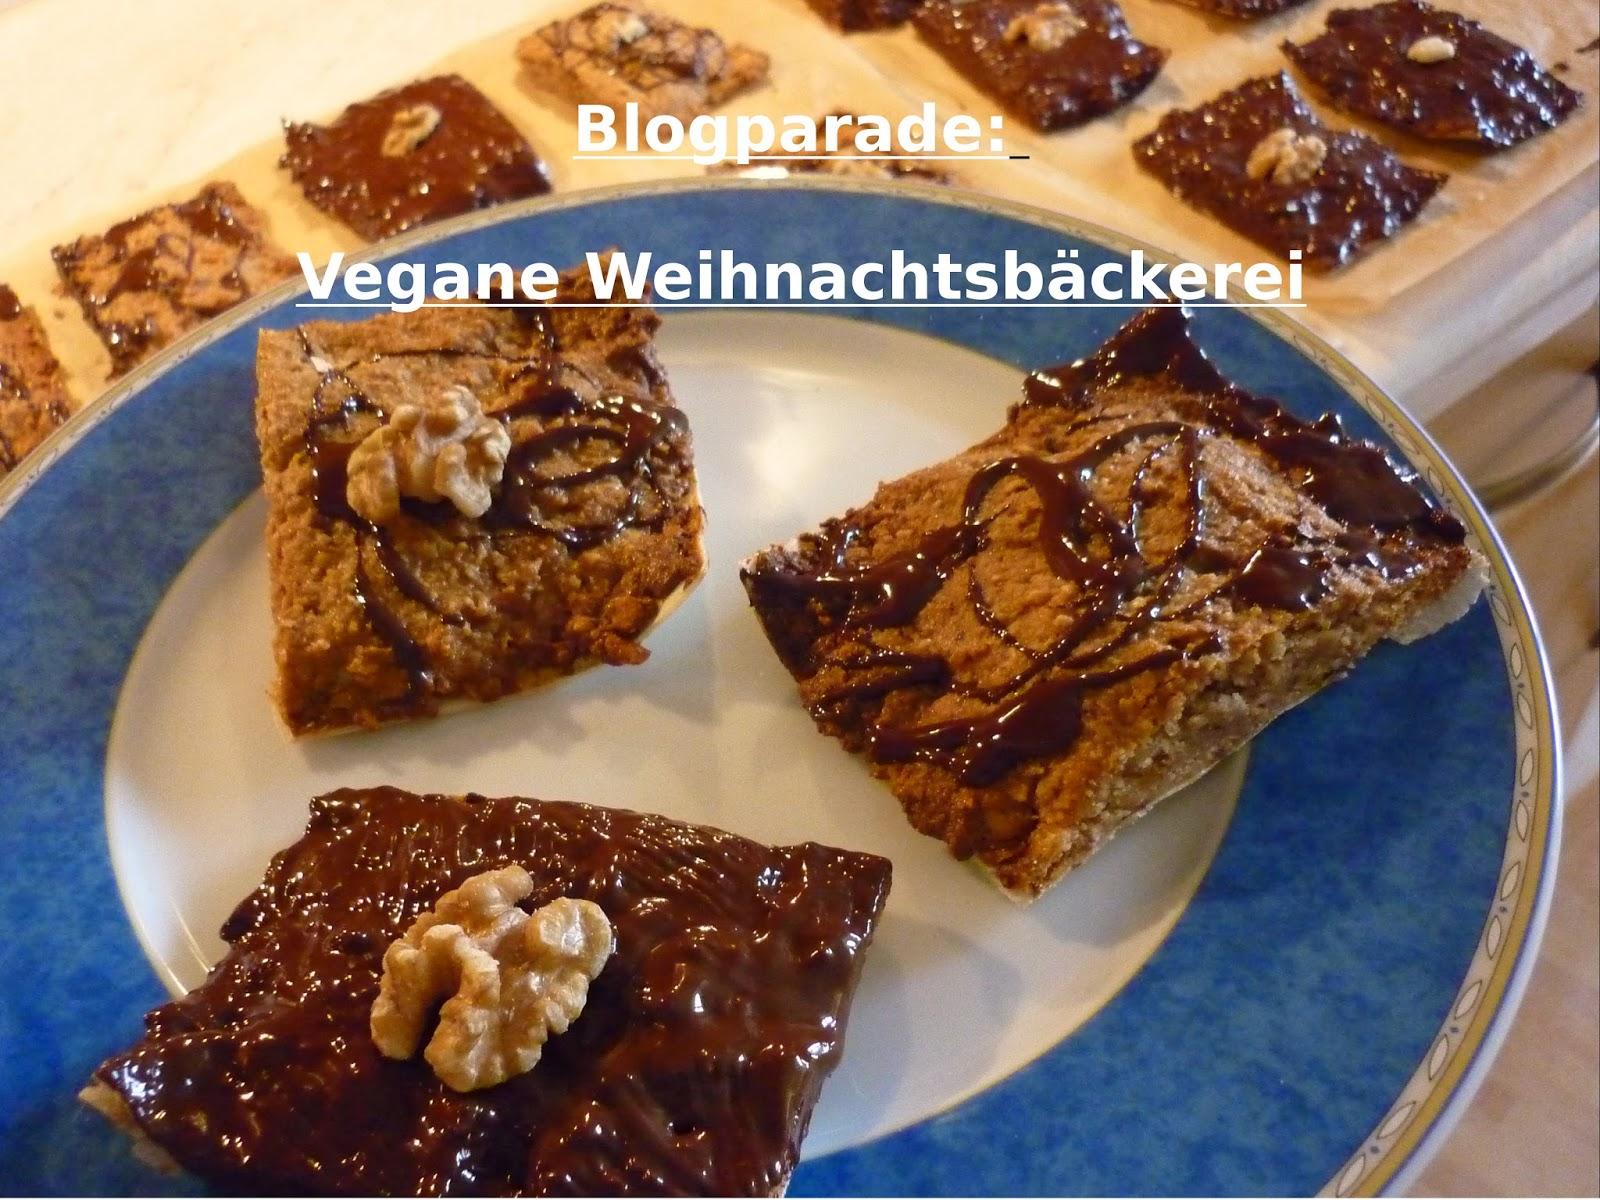 Blogparade Vegane Weihnachtsbäckerei